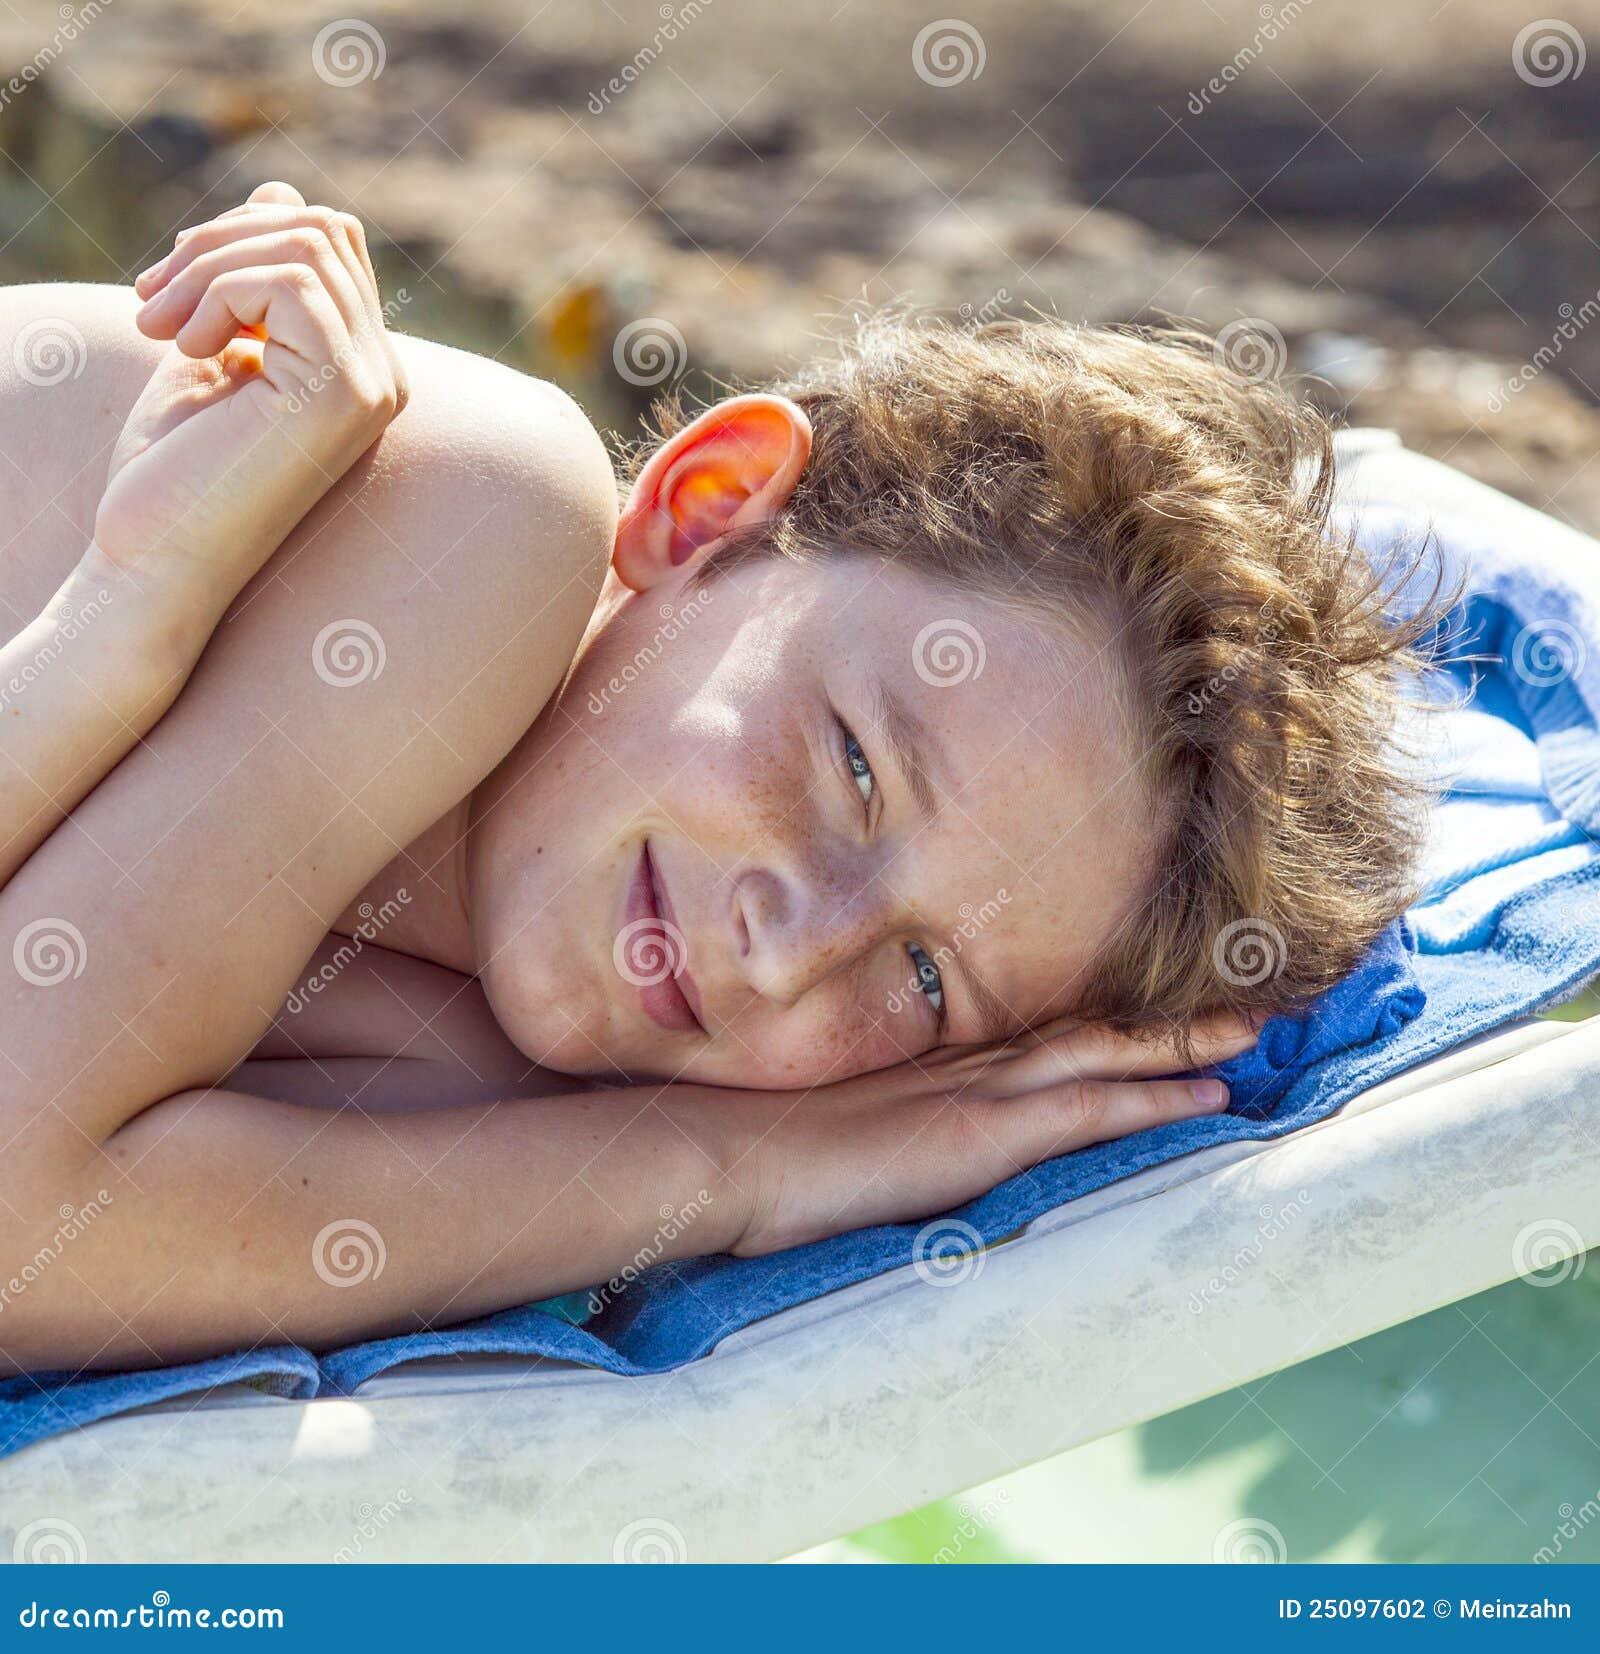 Relaxed Boy Enjoys Lying On A Beach Lounger Stock Photo